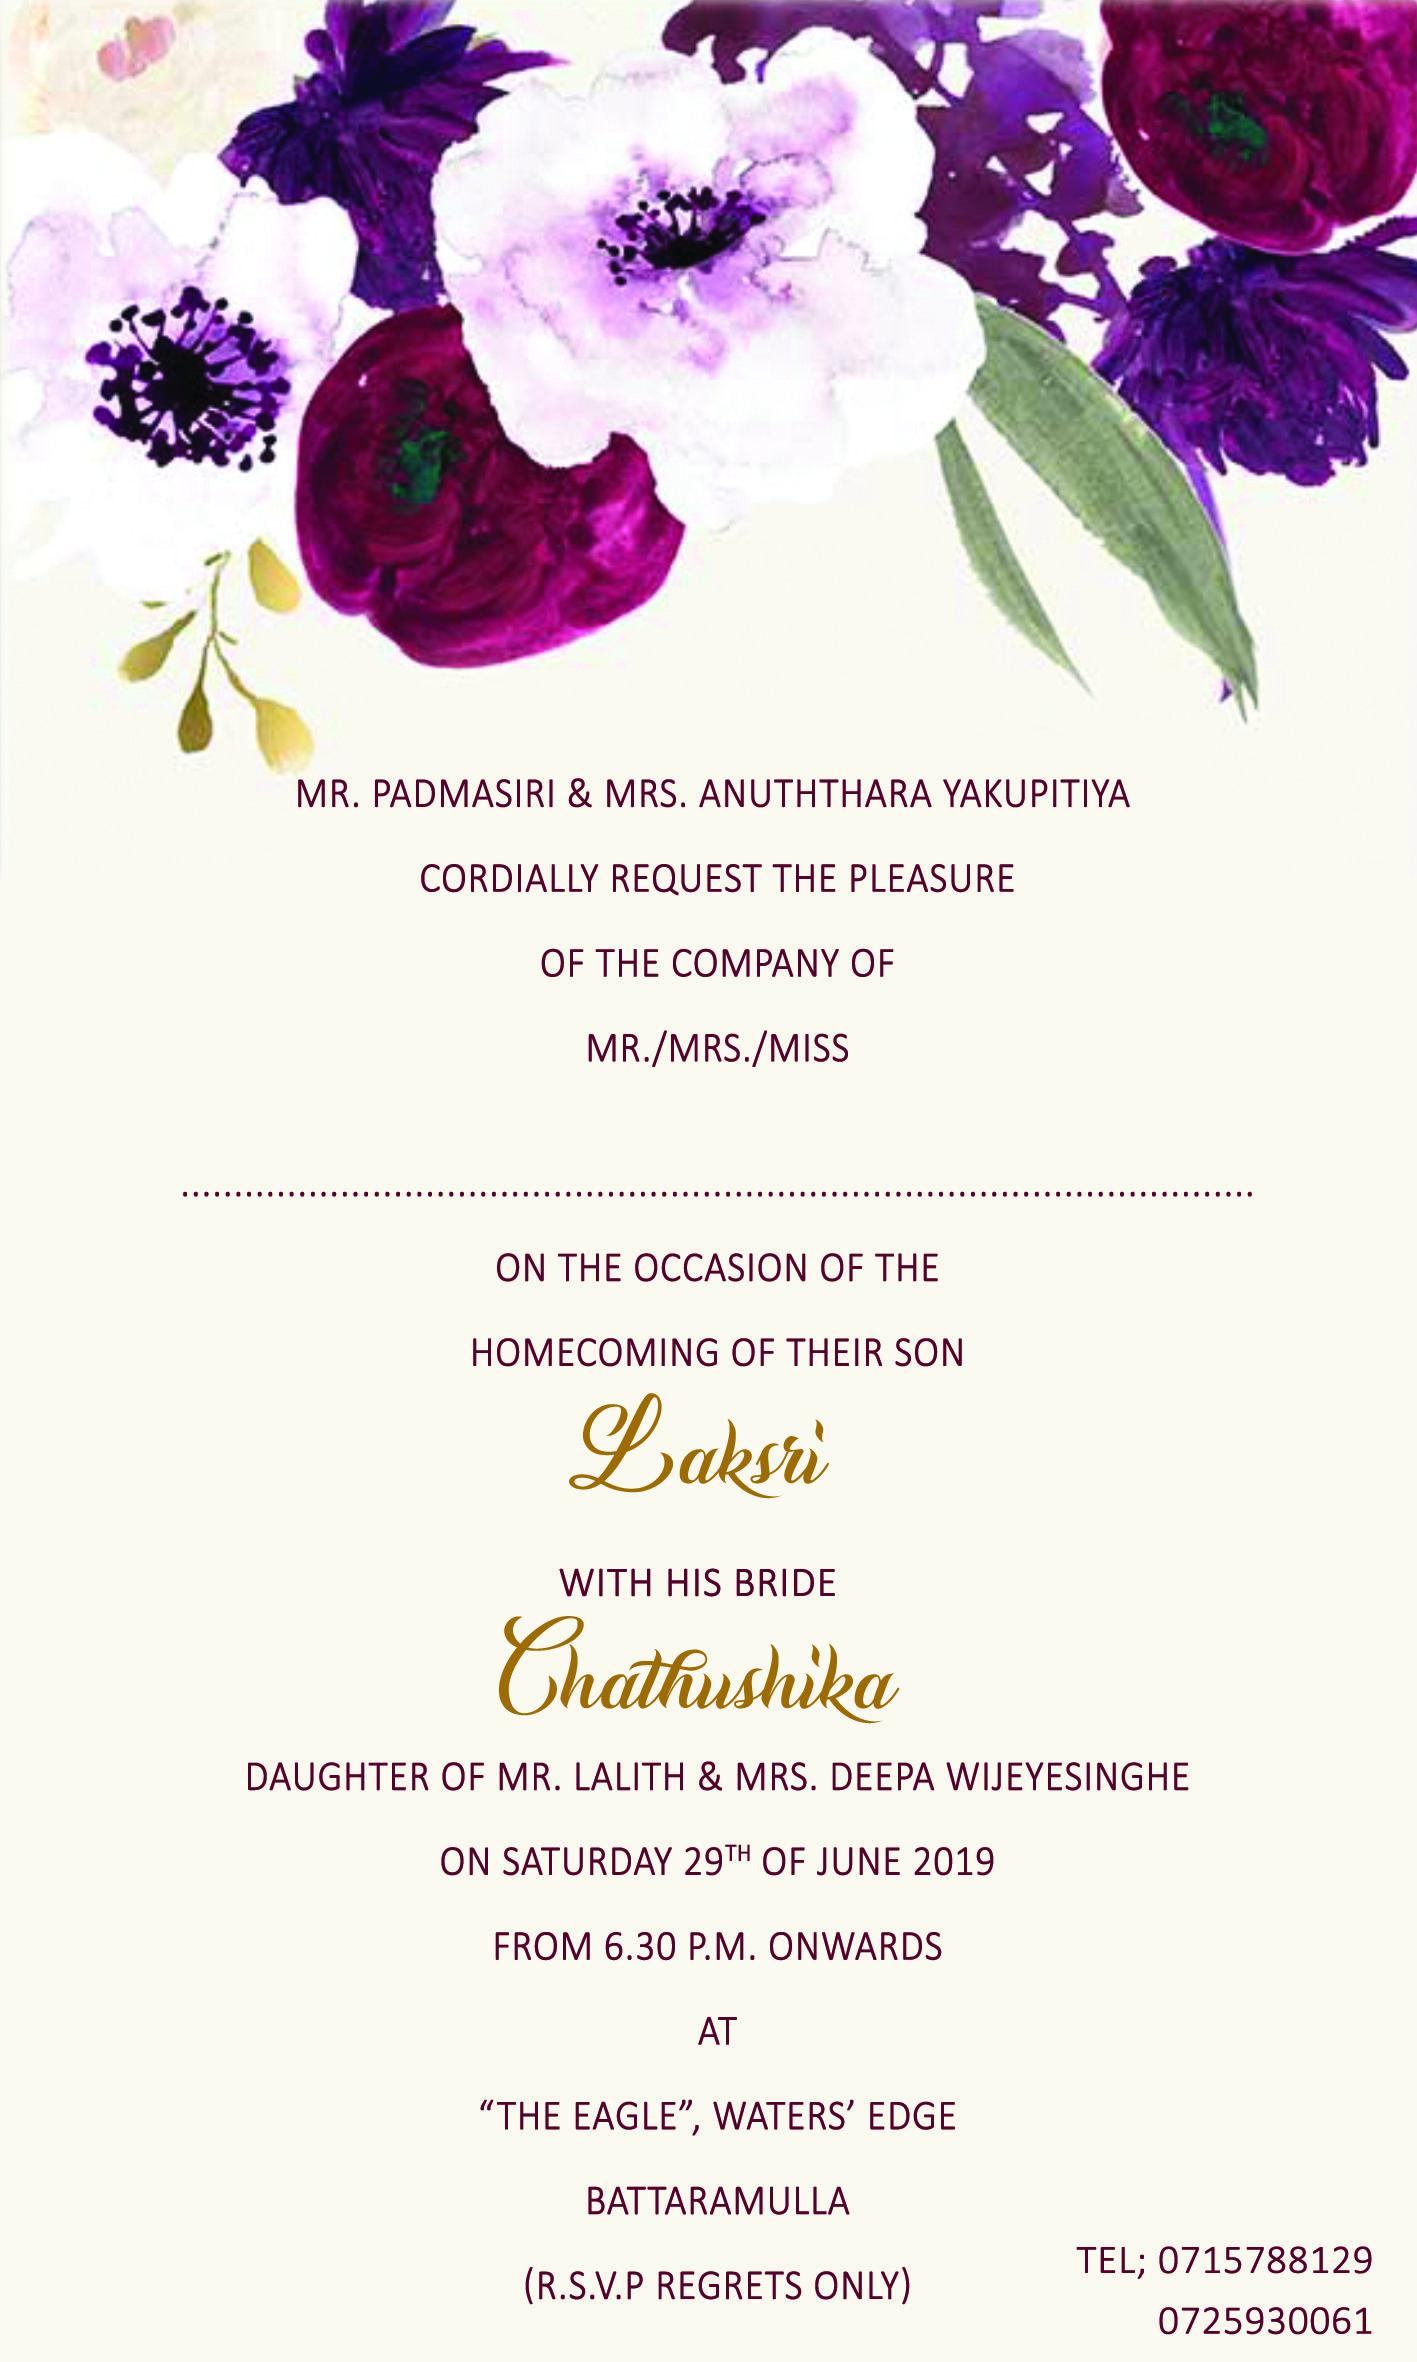 wedding homecoming card wedding cards